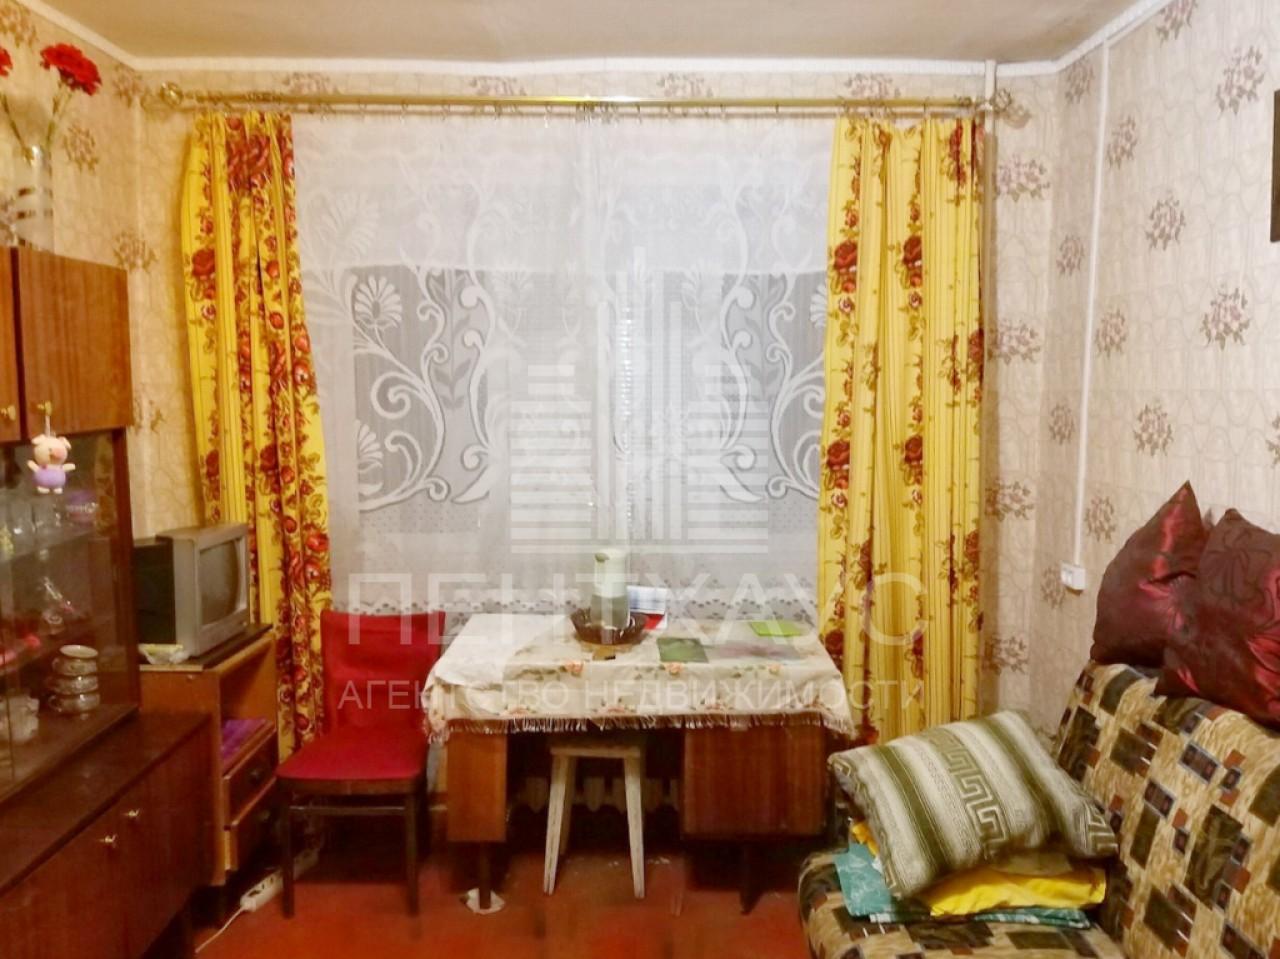 г. Владимир, Усти-на-Лабе, 22, комната на продажу